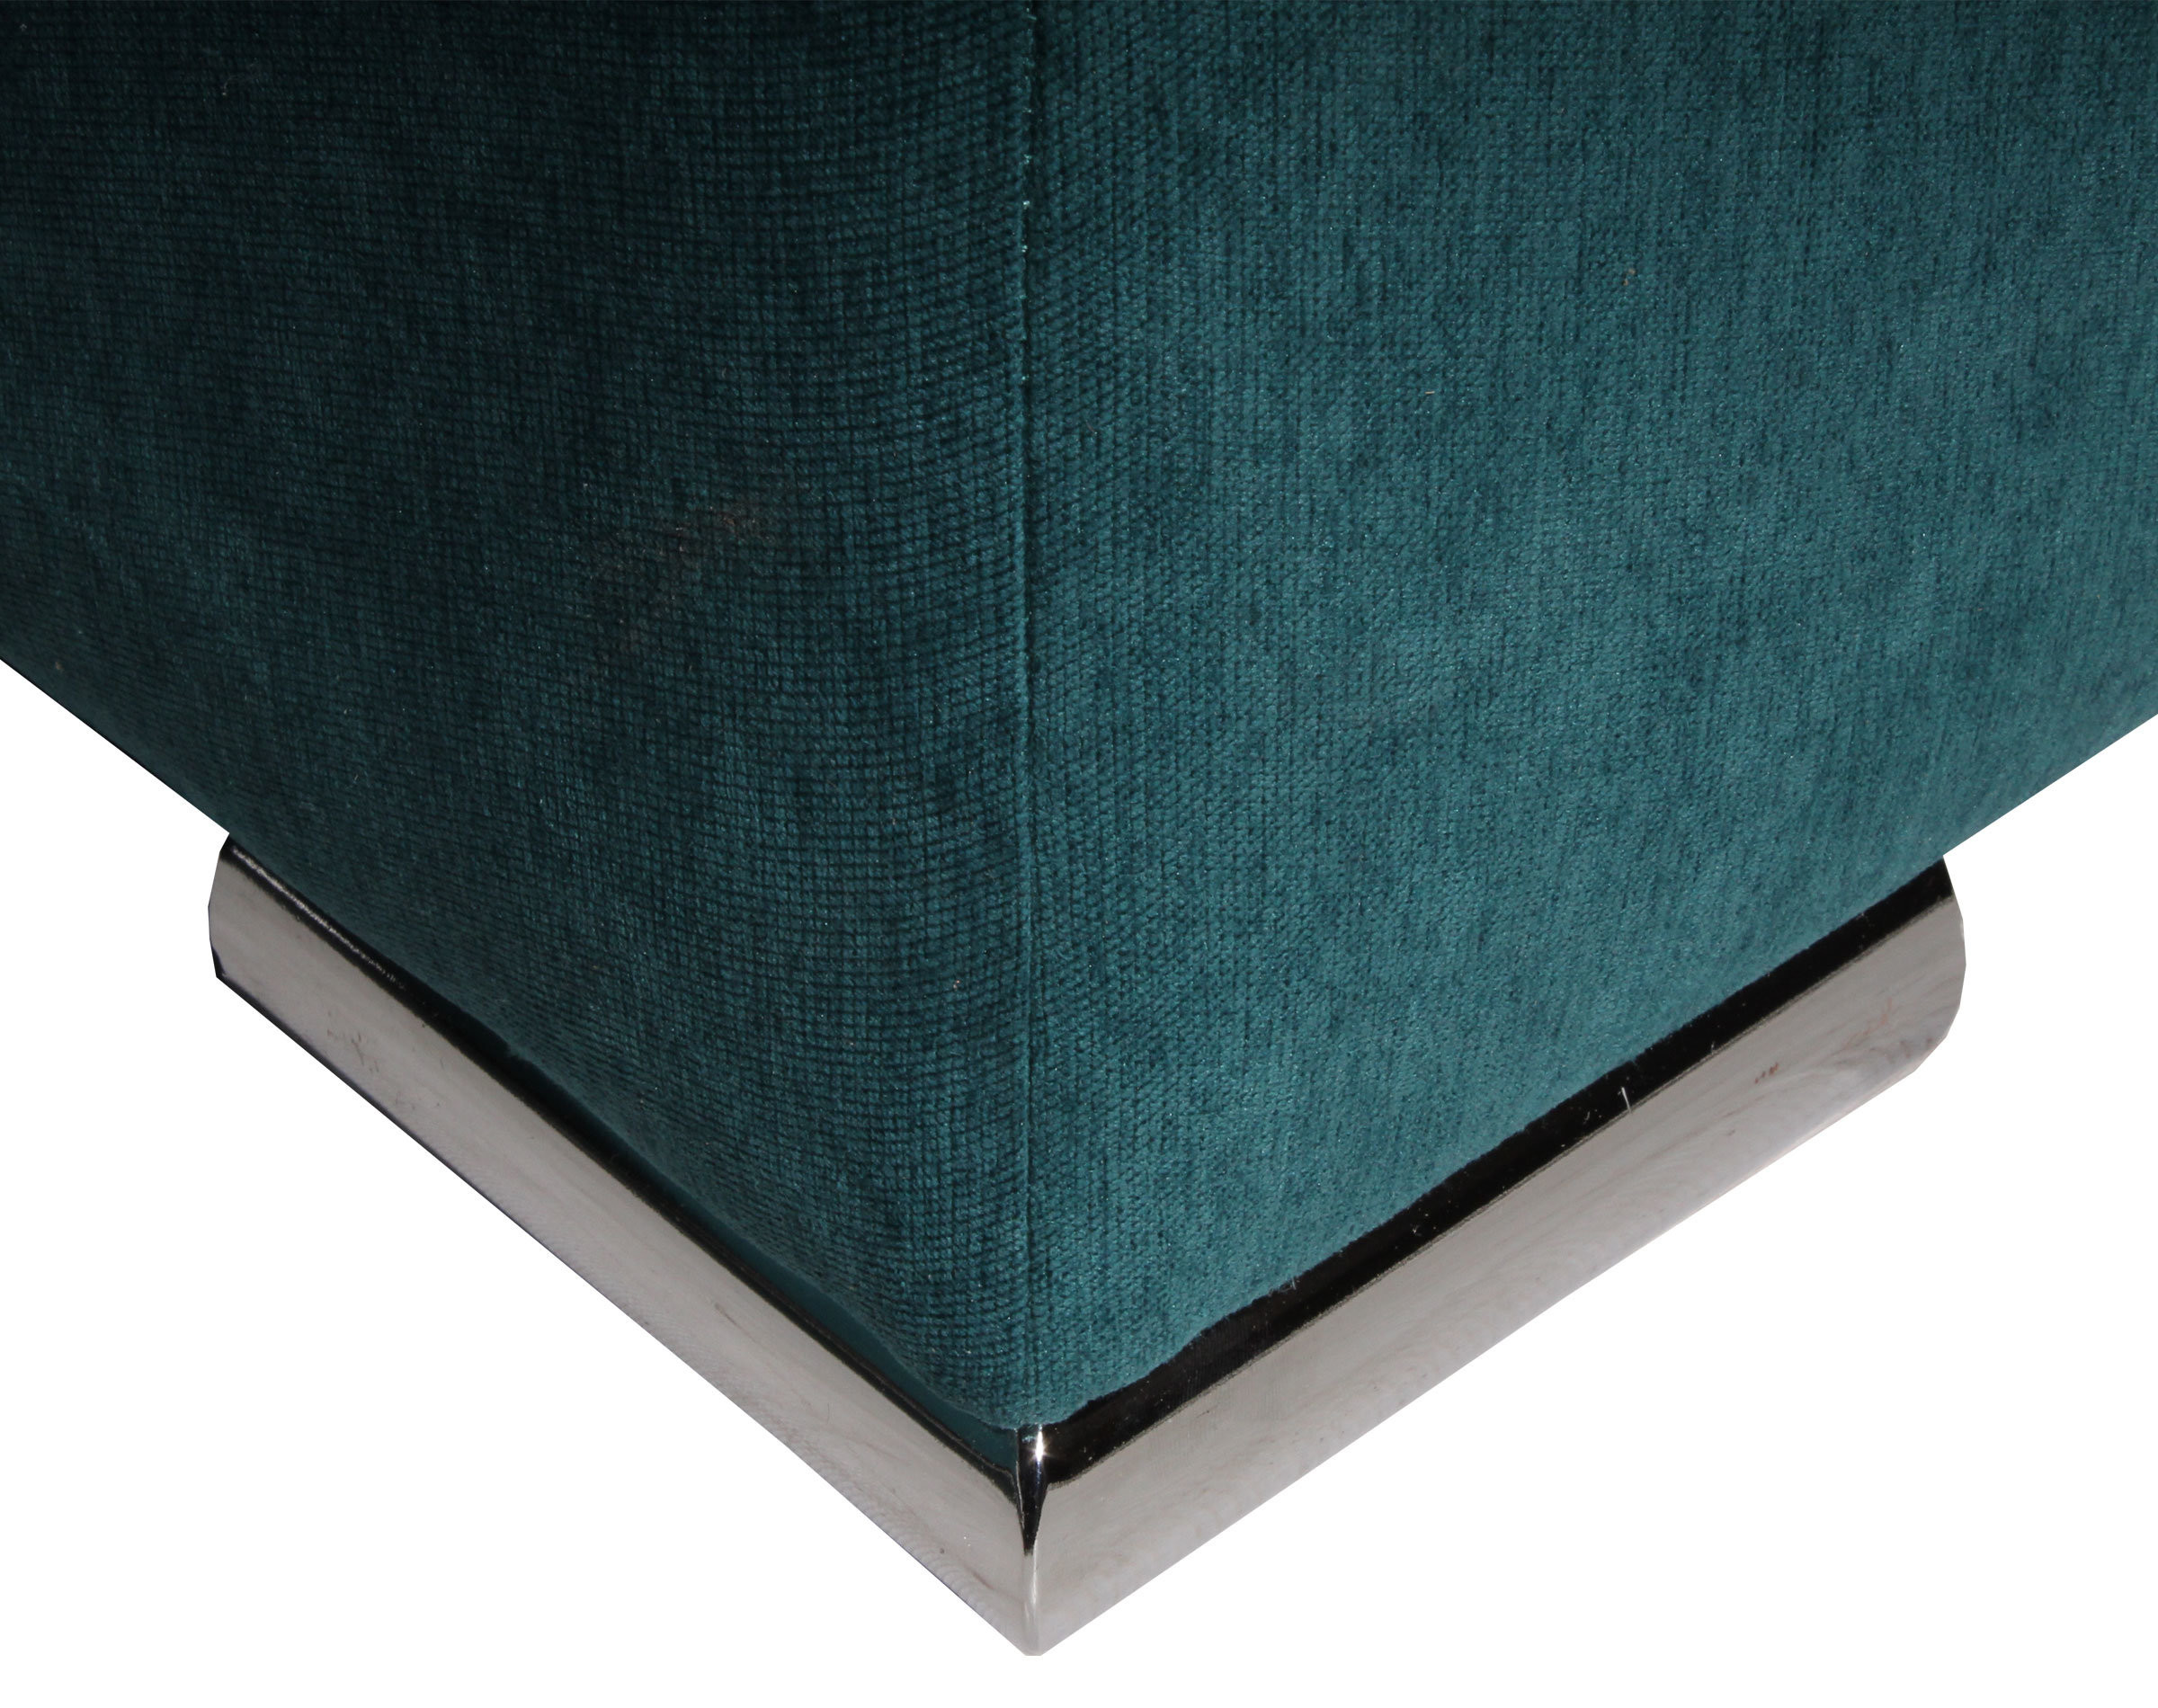 patas metálicas para sofas